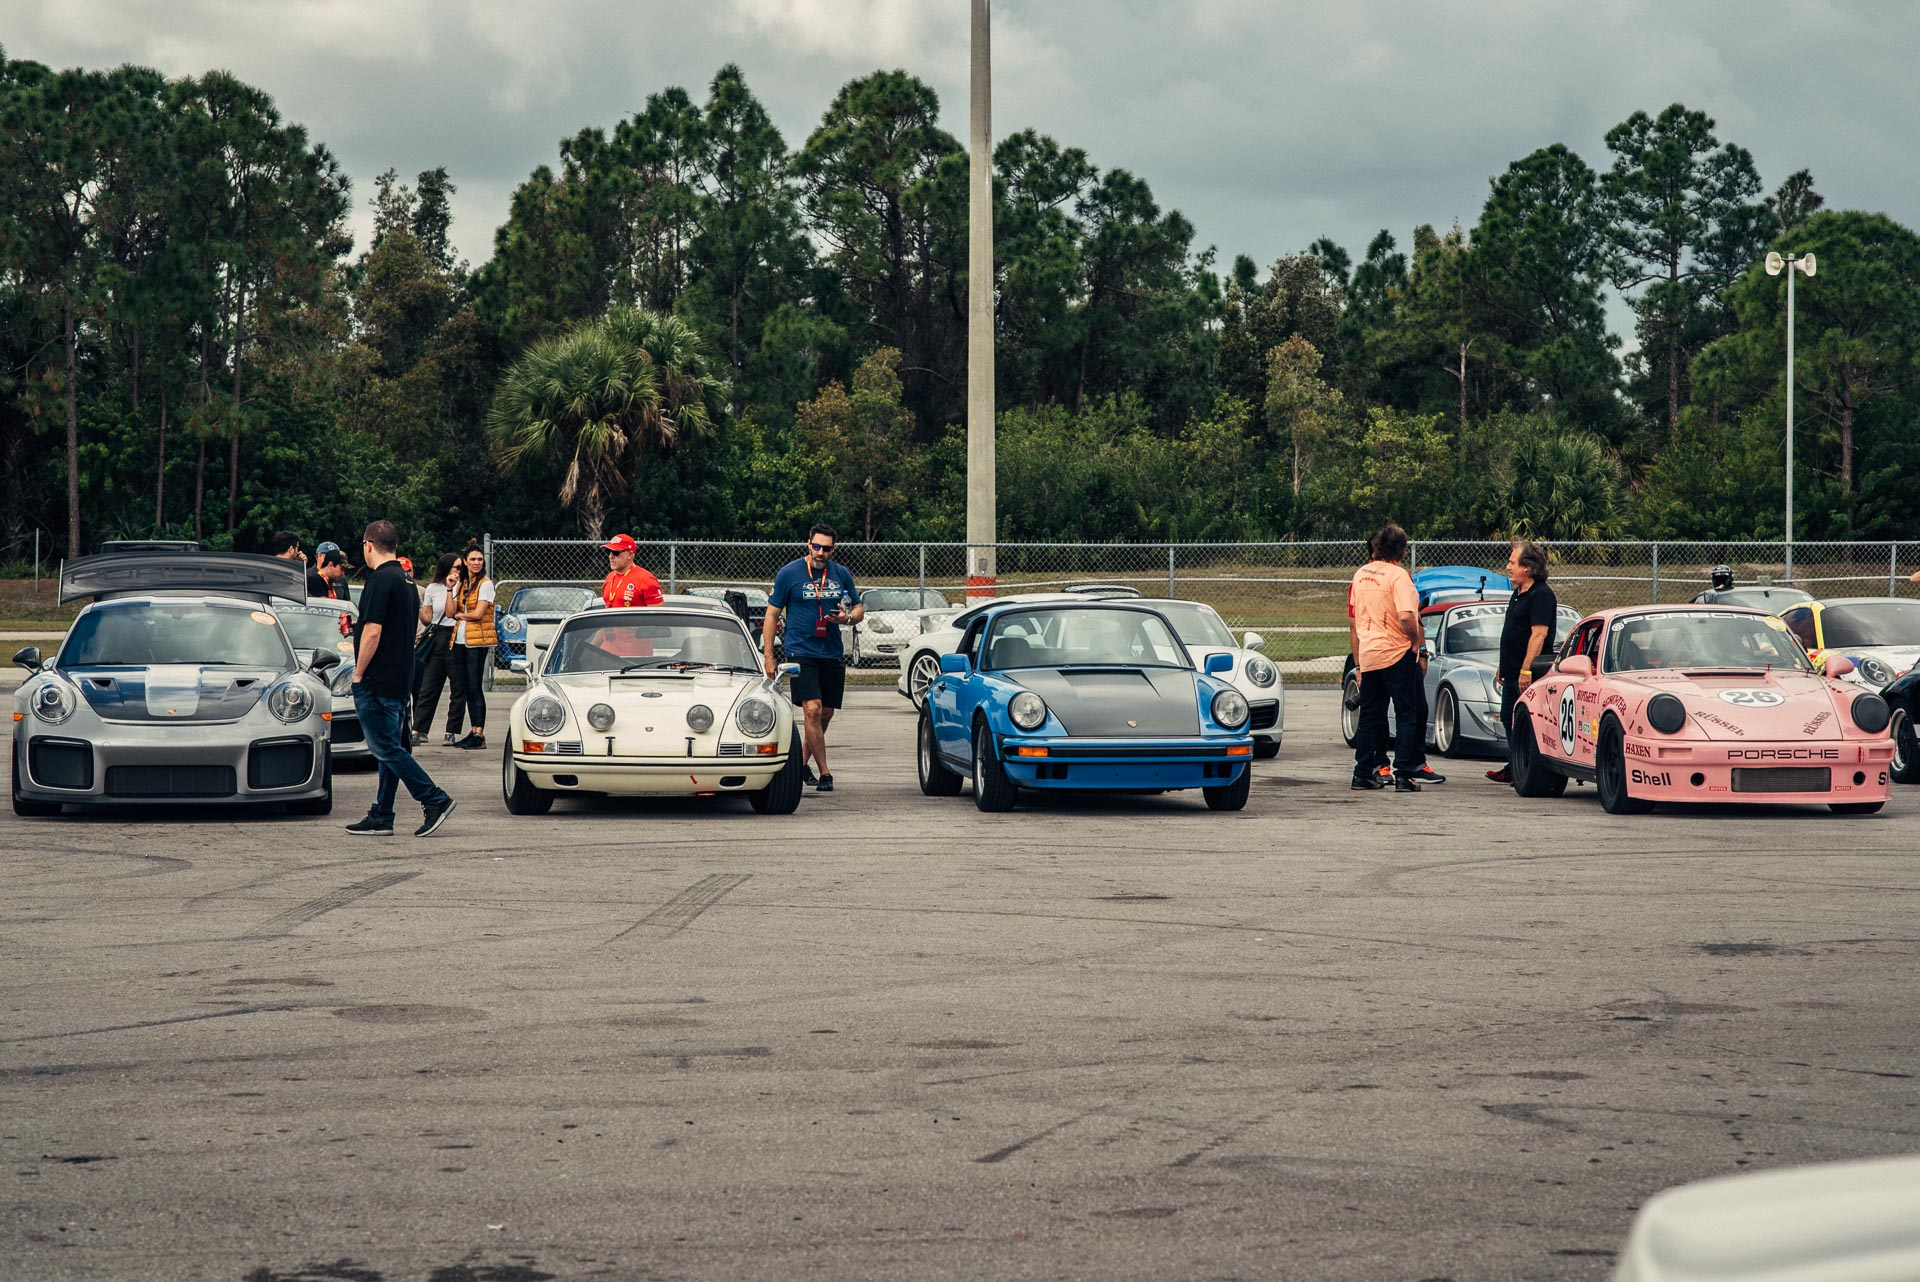 Porsches lined up at DRT Das Renn Treffen 2019